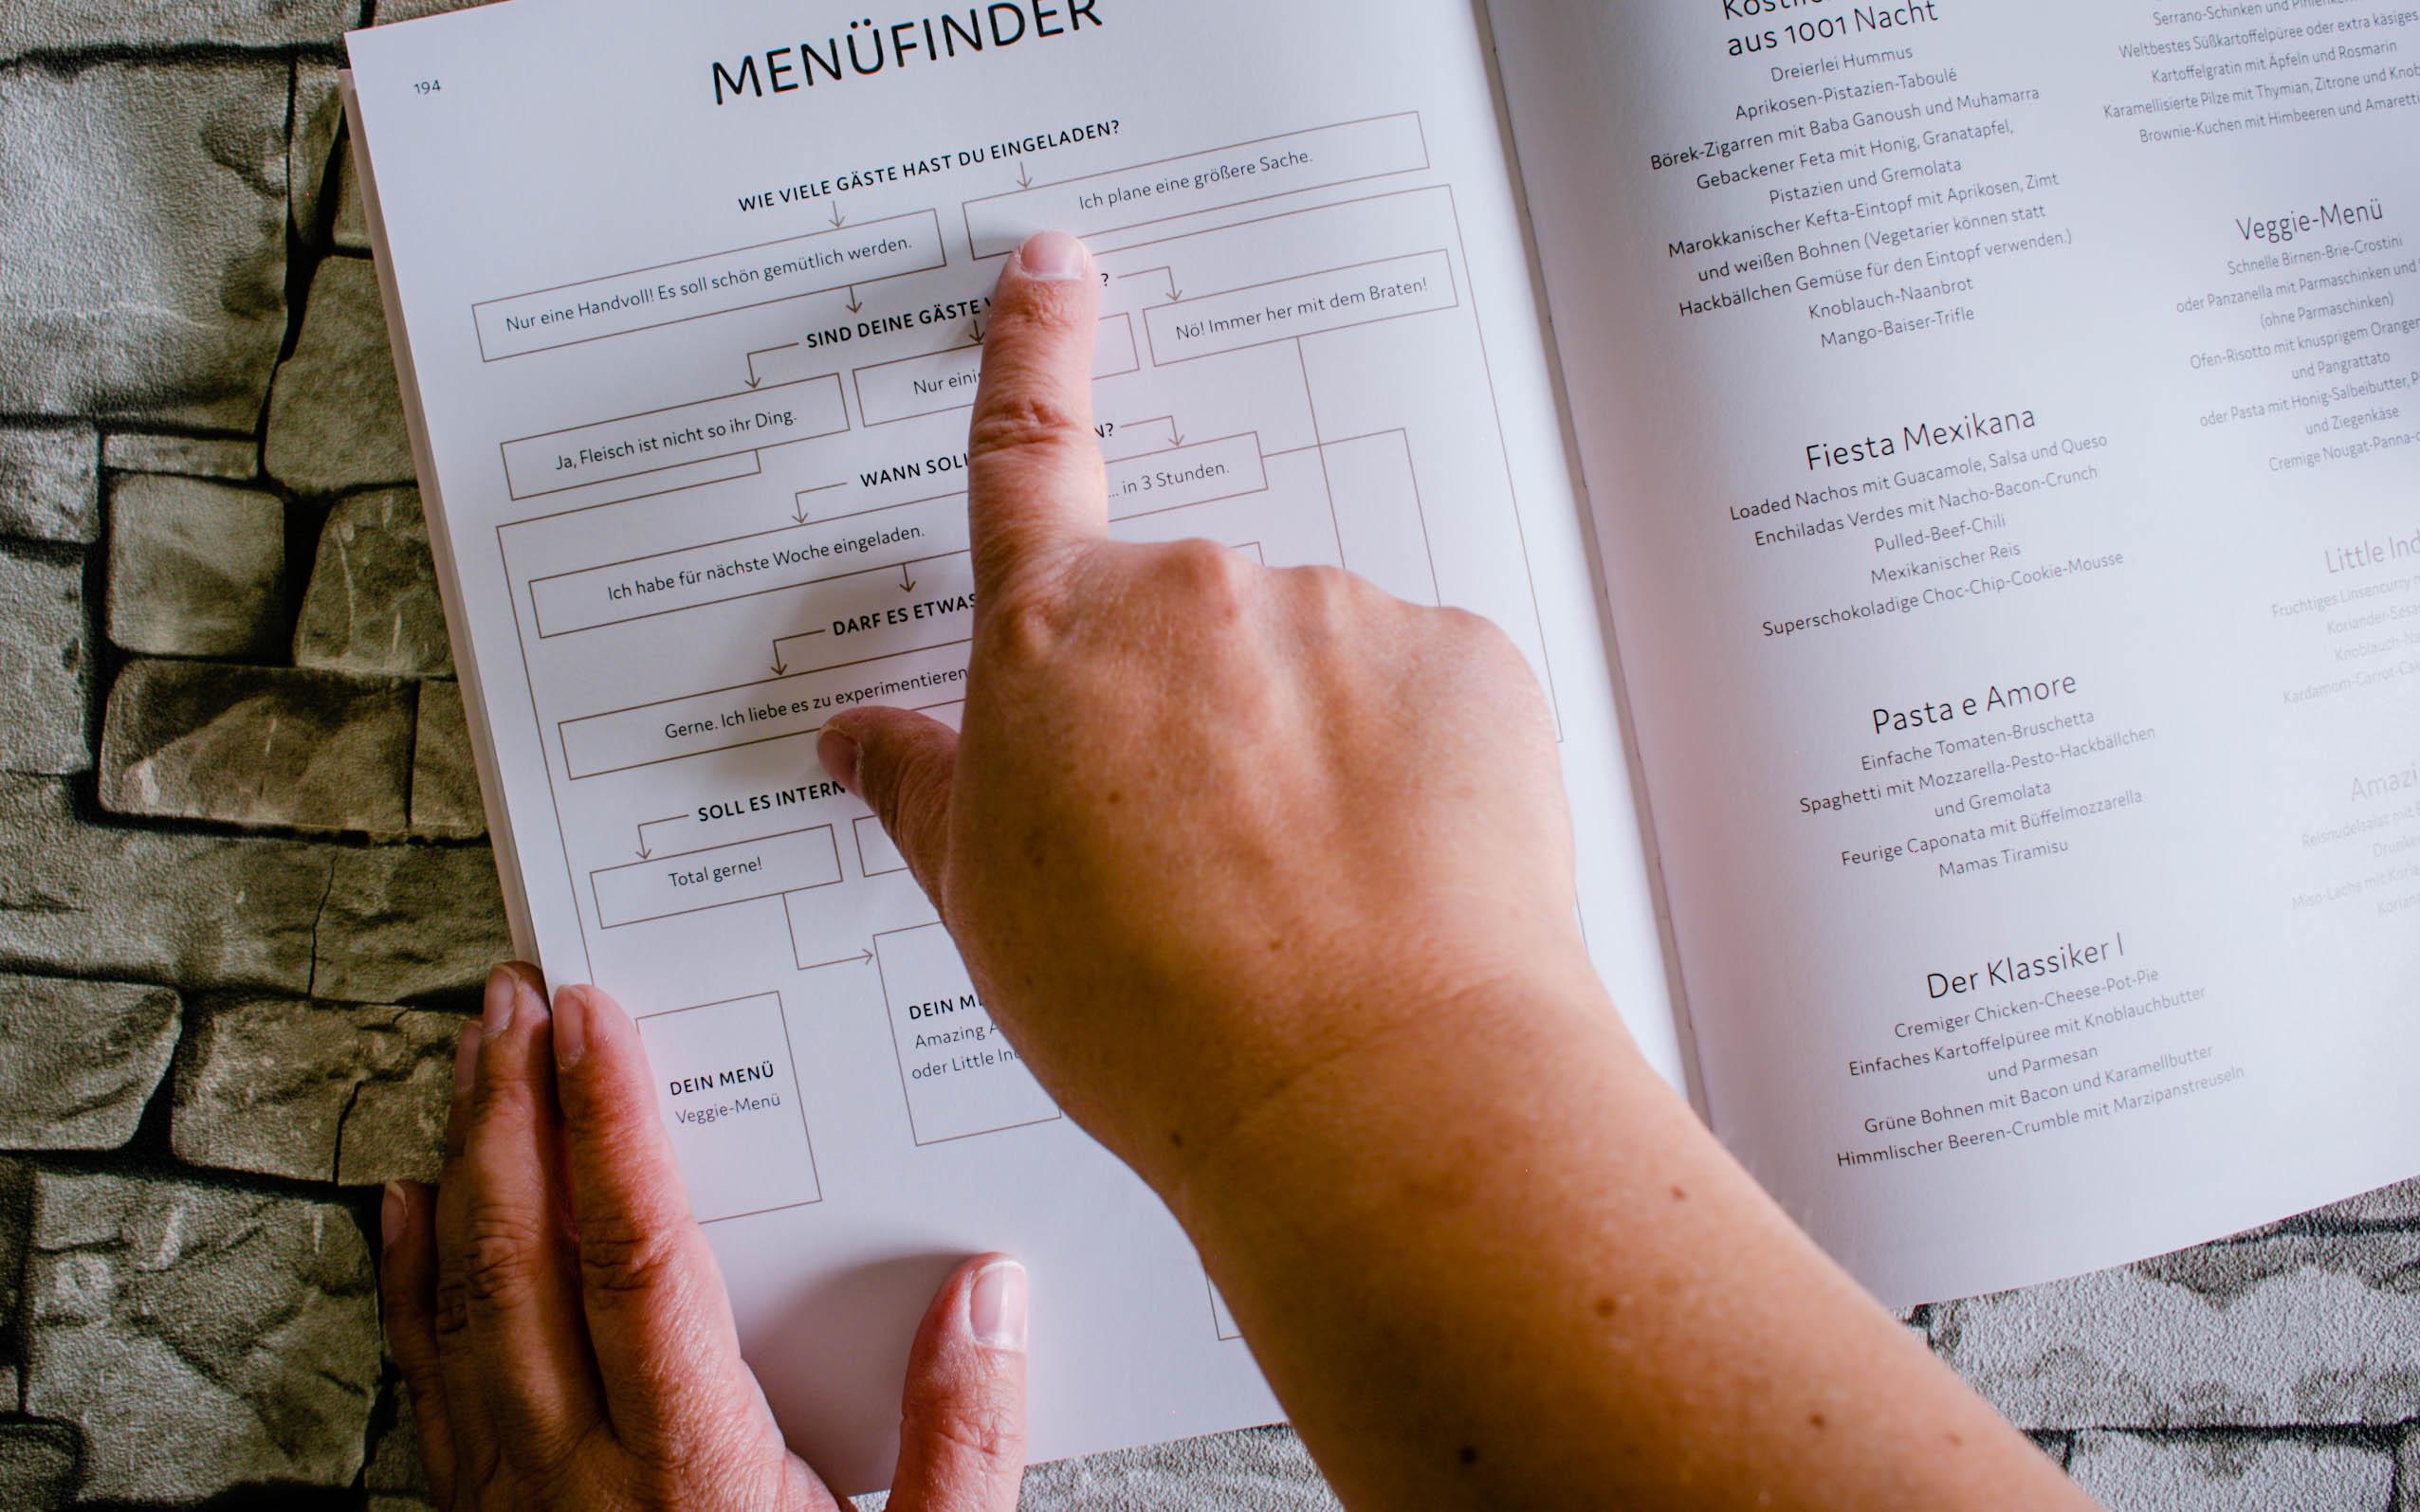 Enikö Gruber – Food, Friends & Love - Menüfinder